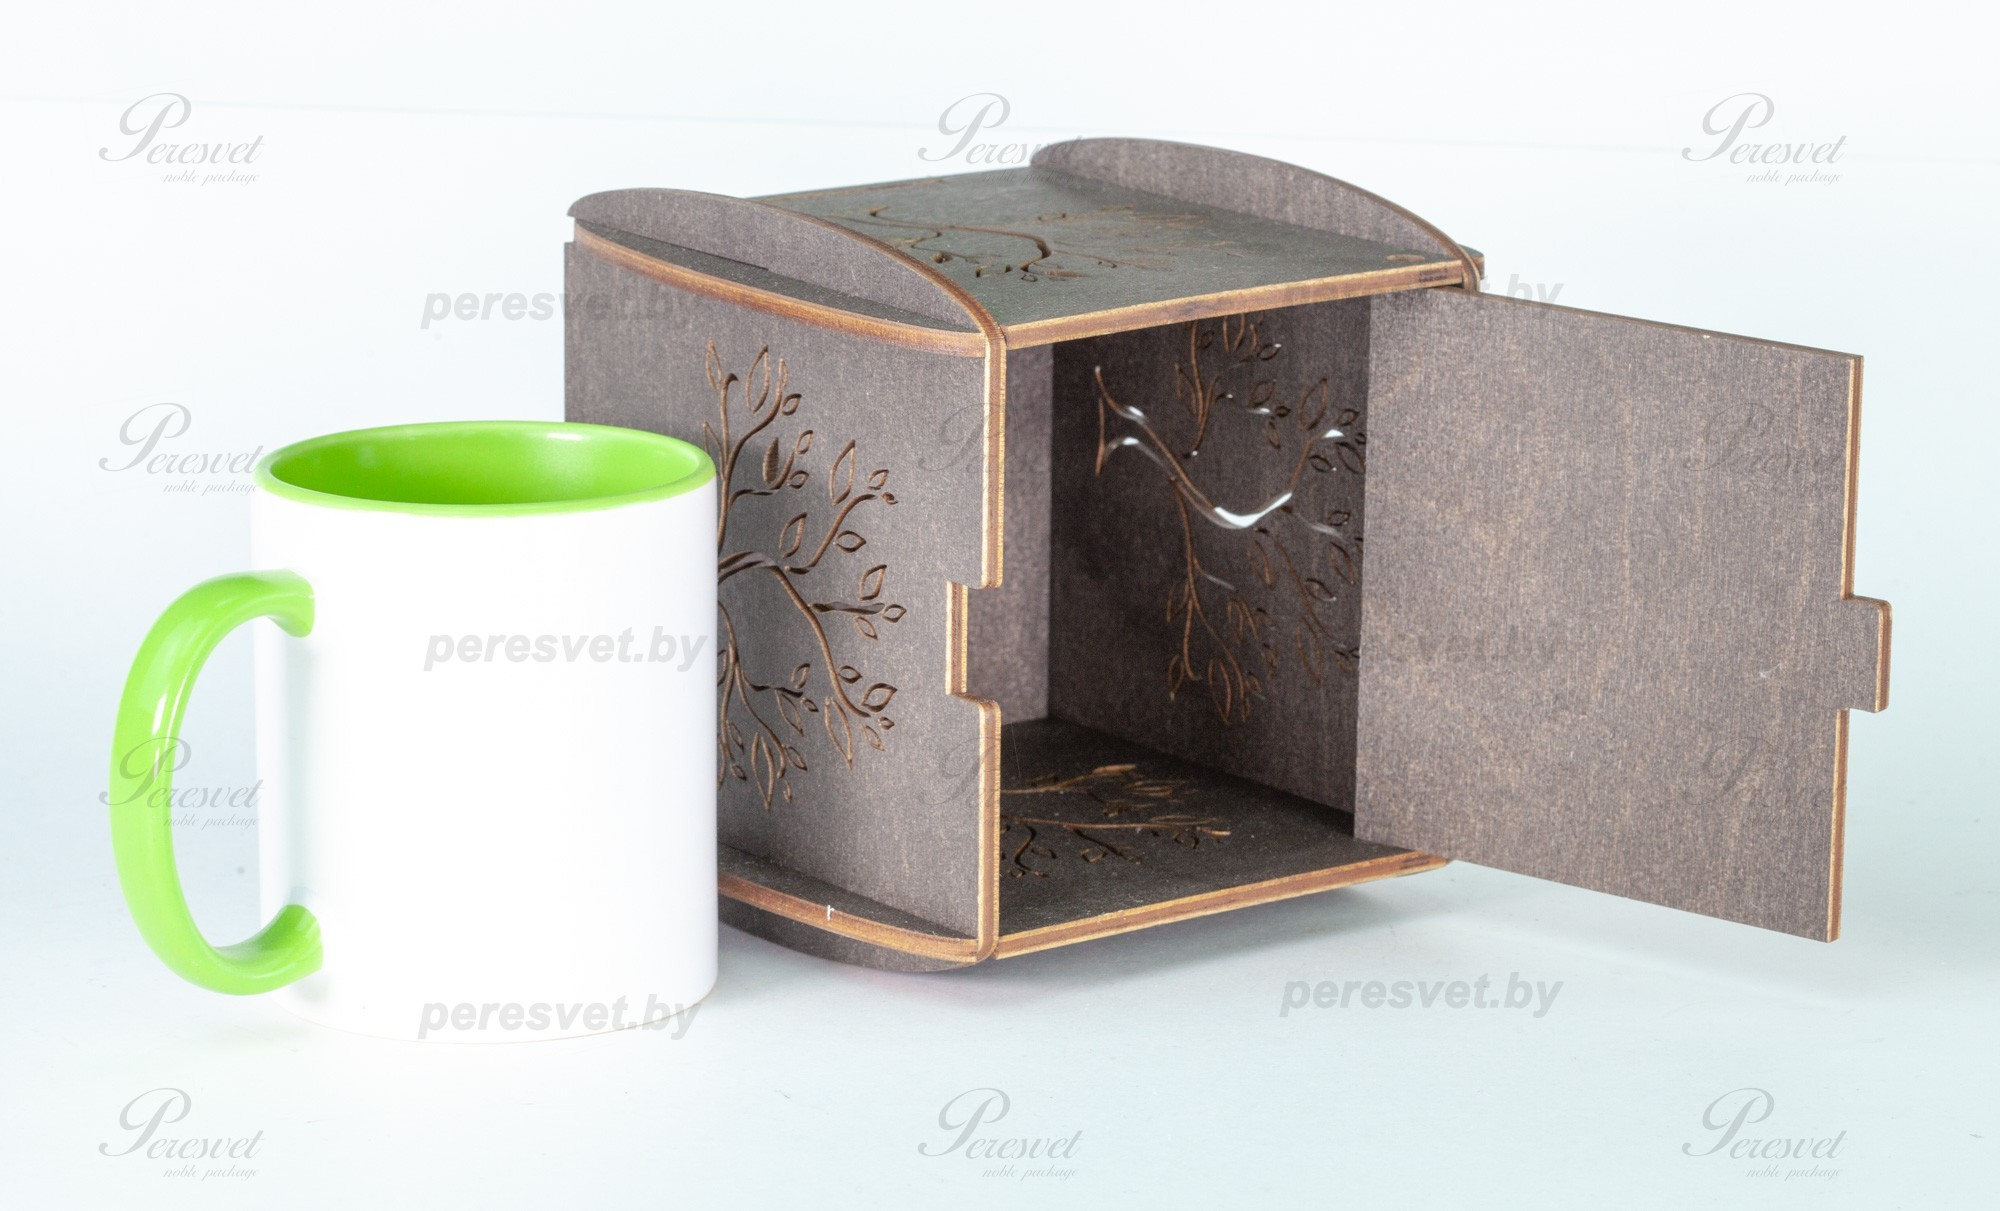 Упаковка деревянная для кружки Древо мечты темная на peresvet.by